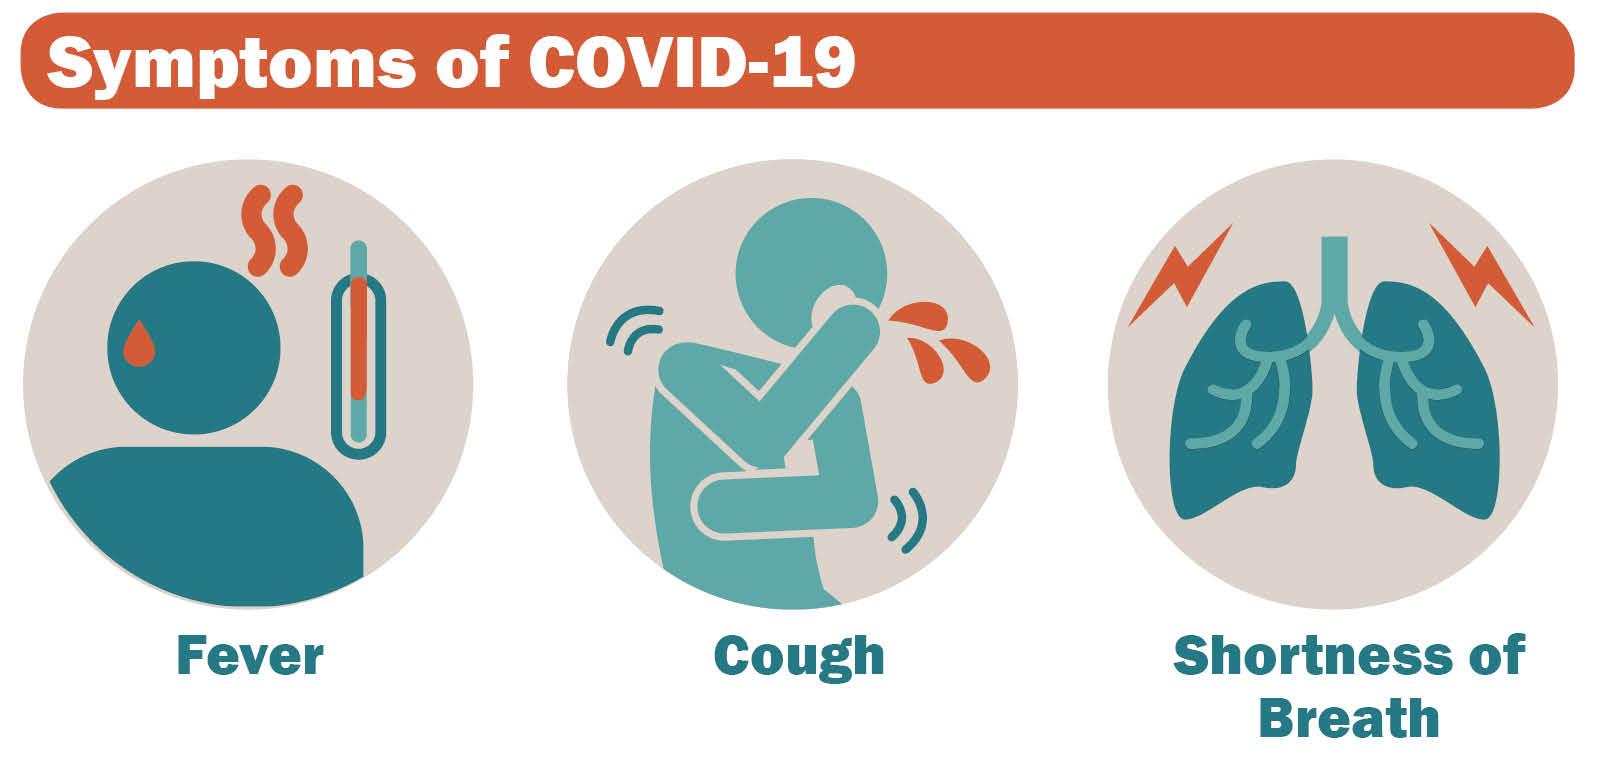 Symptoms: Fever, Cough, Shortness of Breath